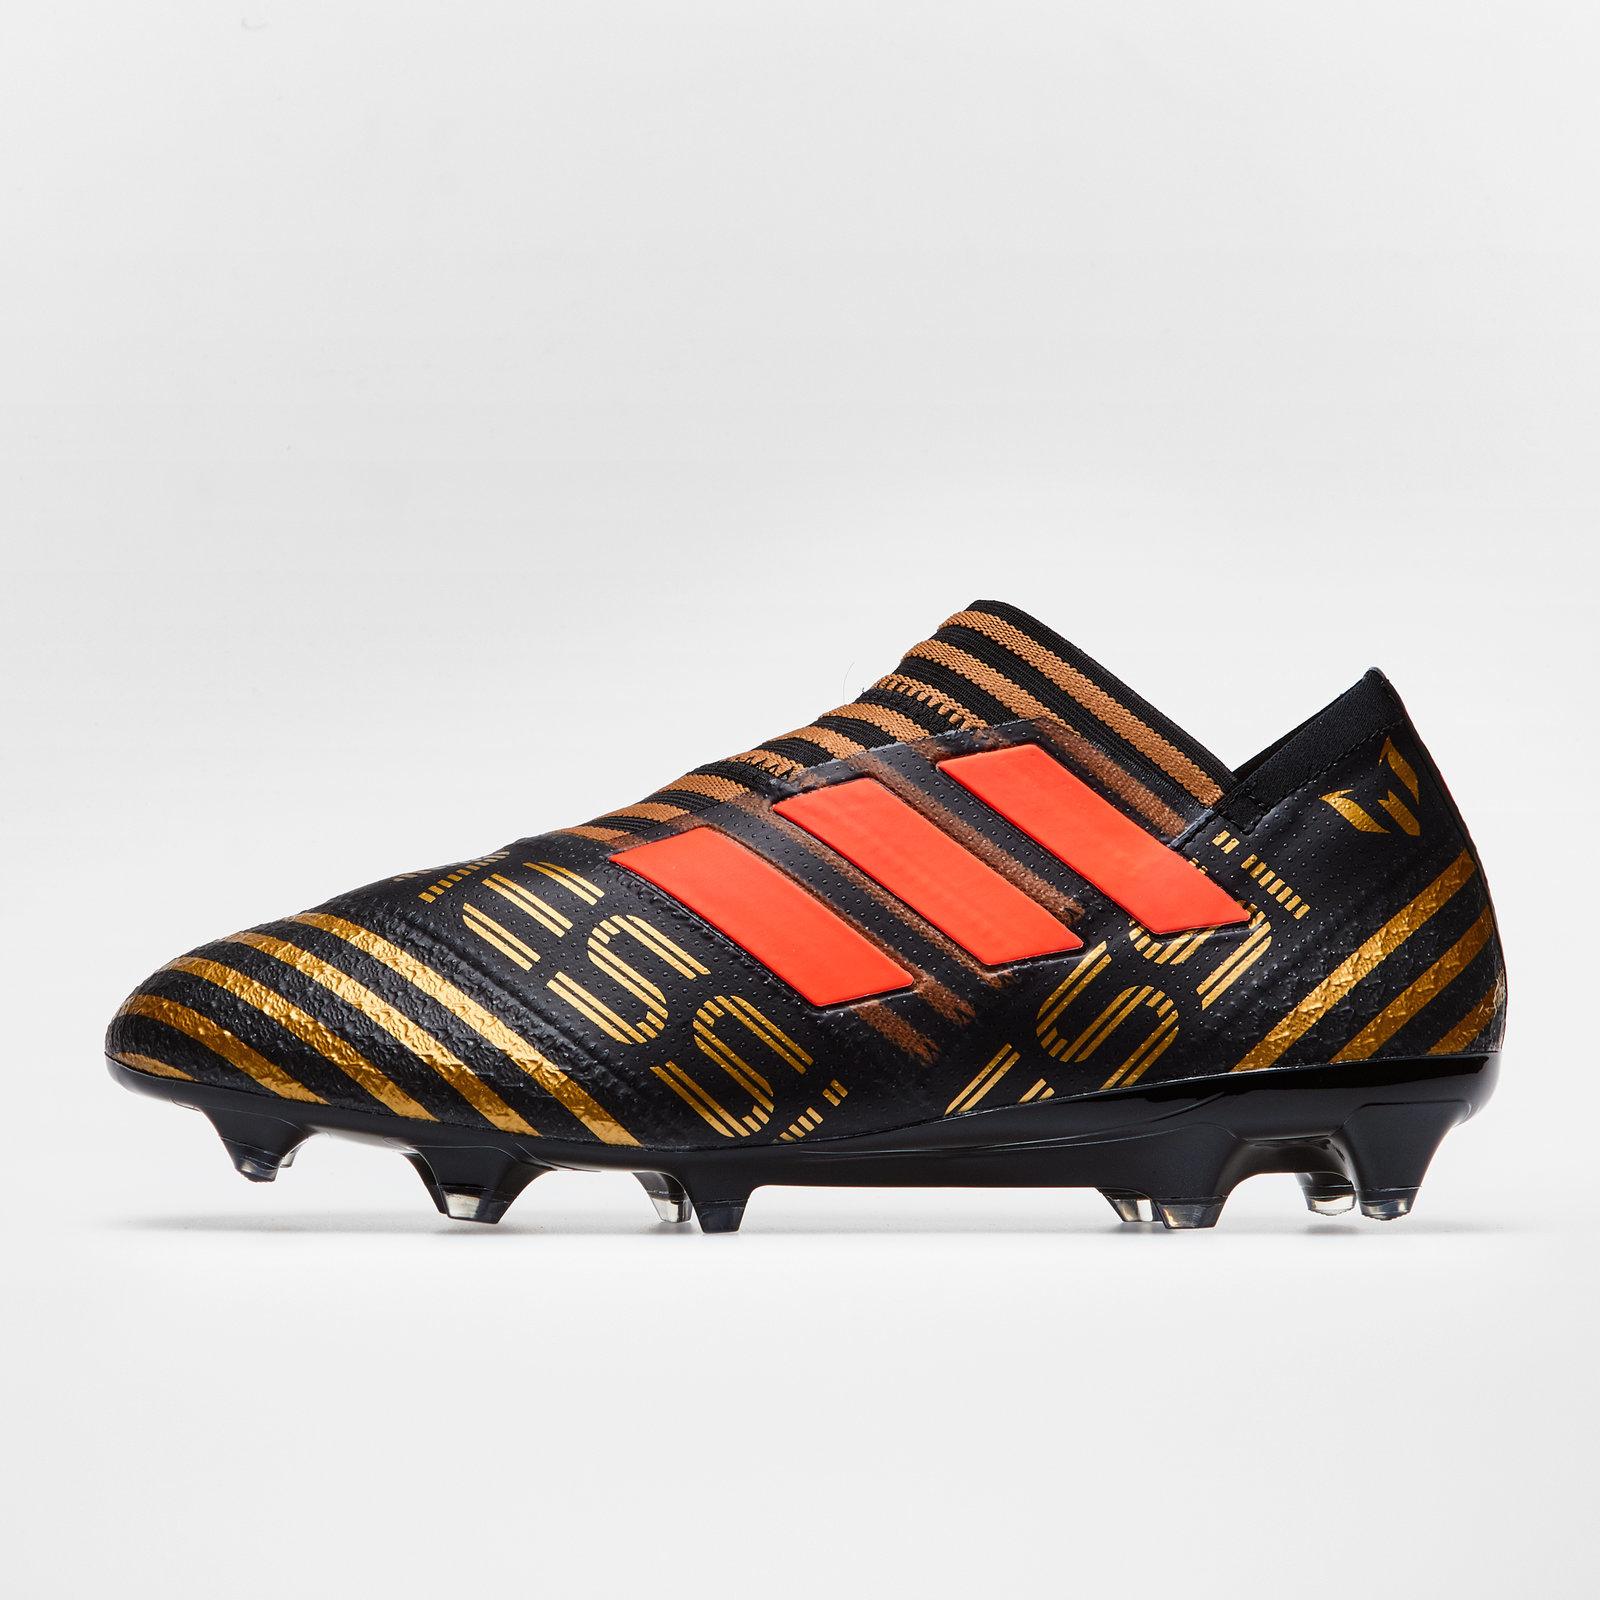 6d77f3fc2 adidas Mens Nemeziz Messi 17+ 360 Agility SG Football Boots Studs Trainers  Black